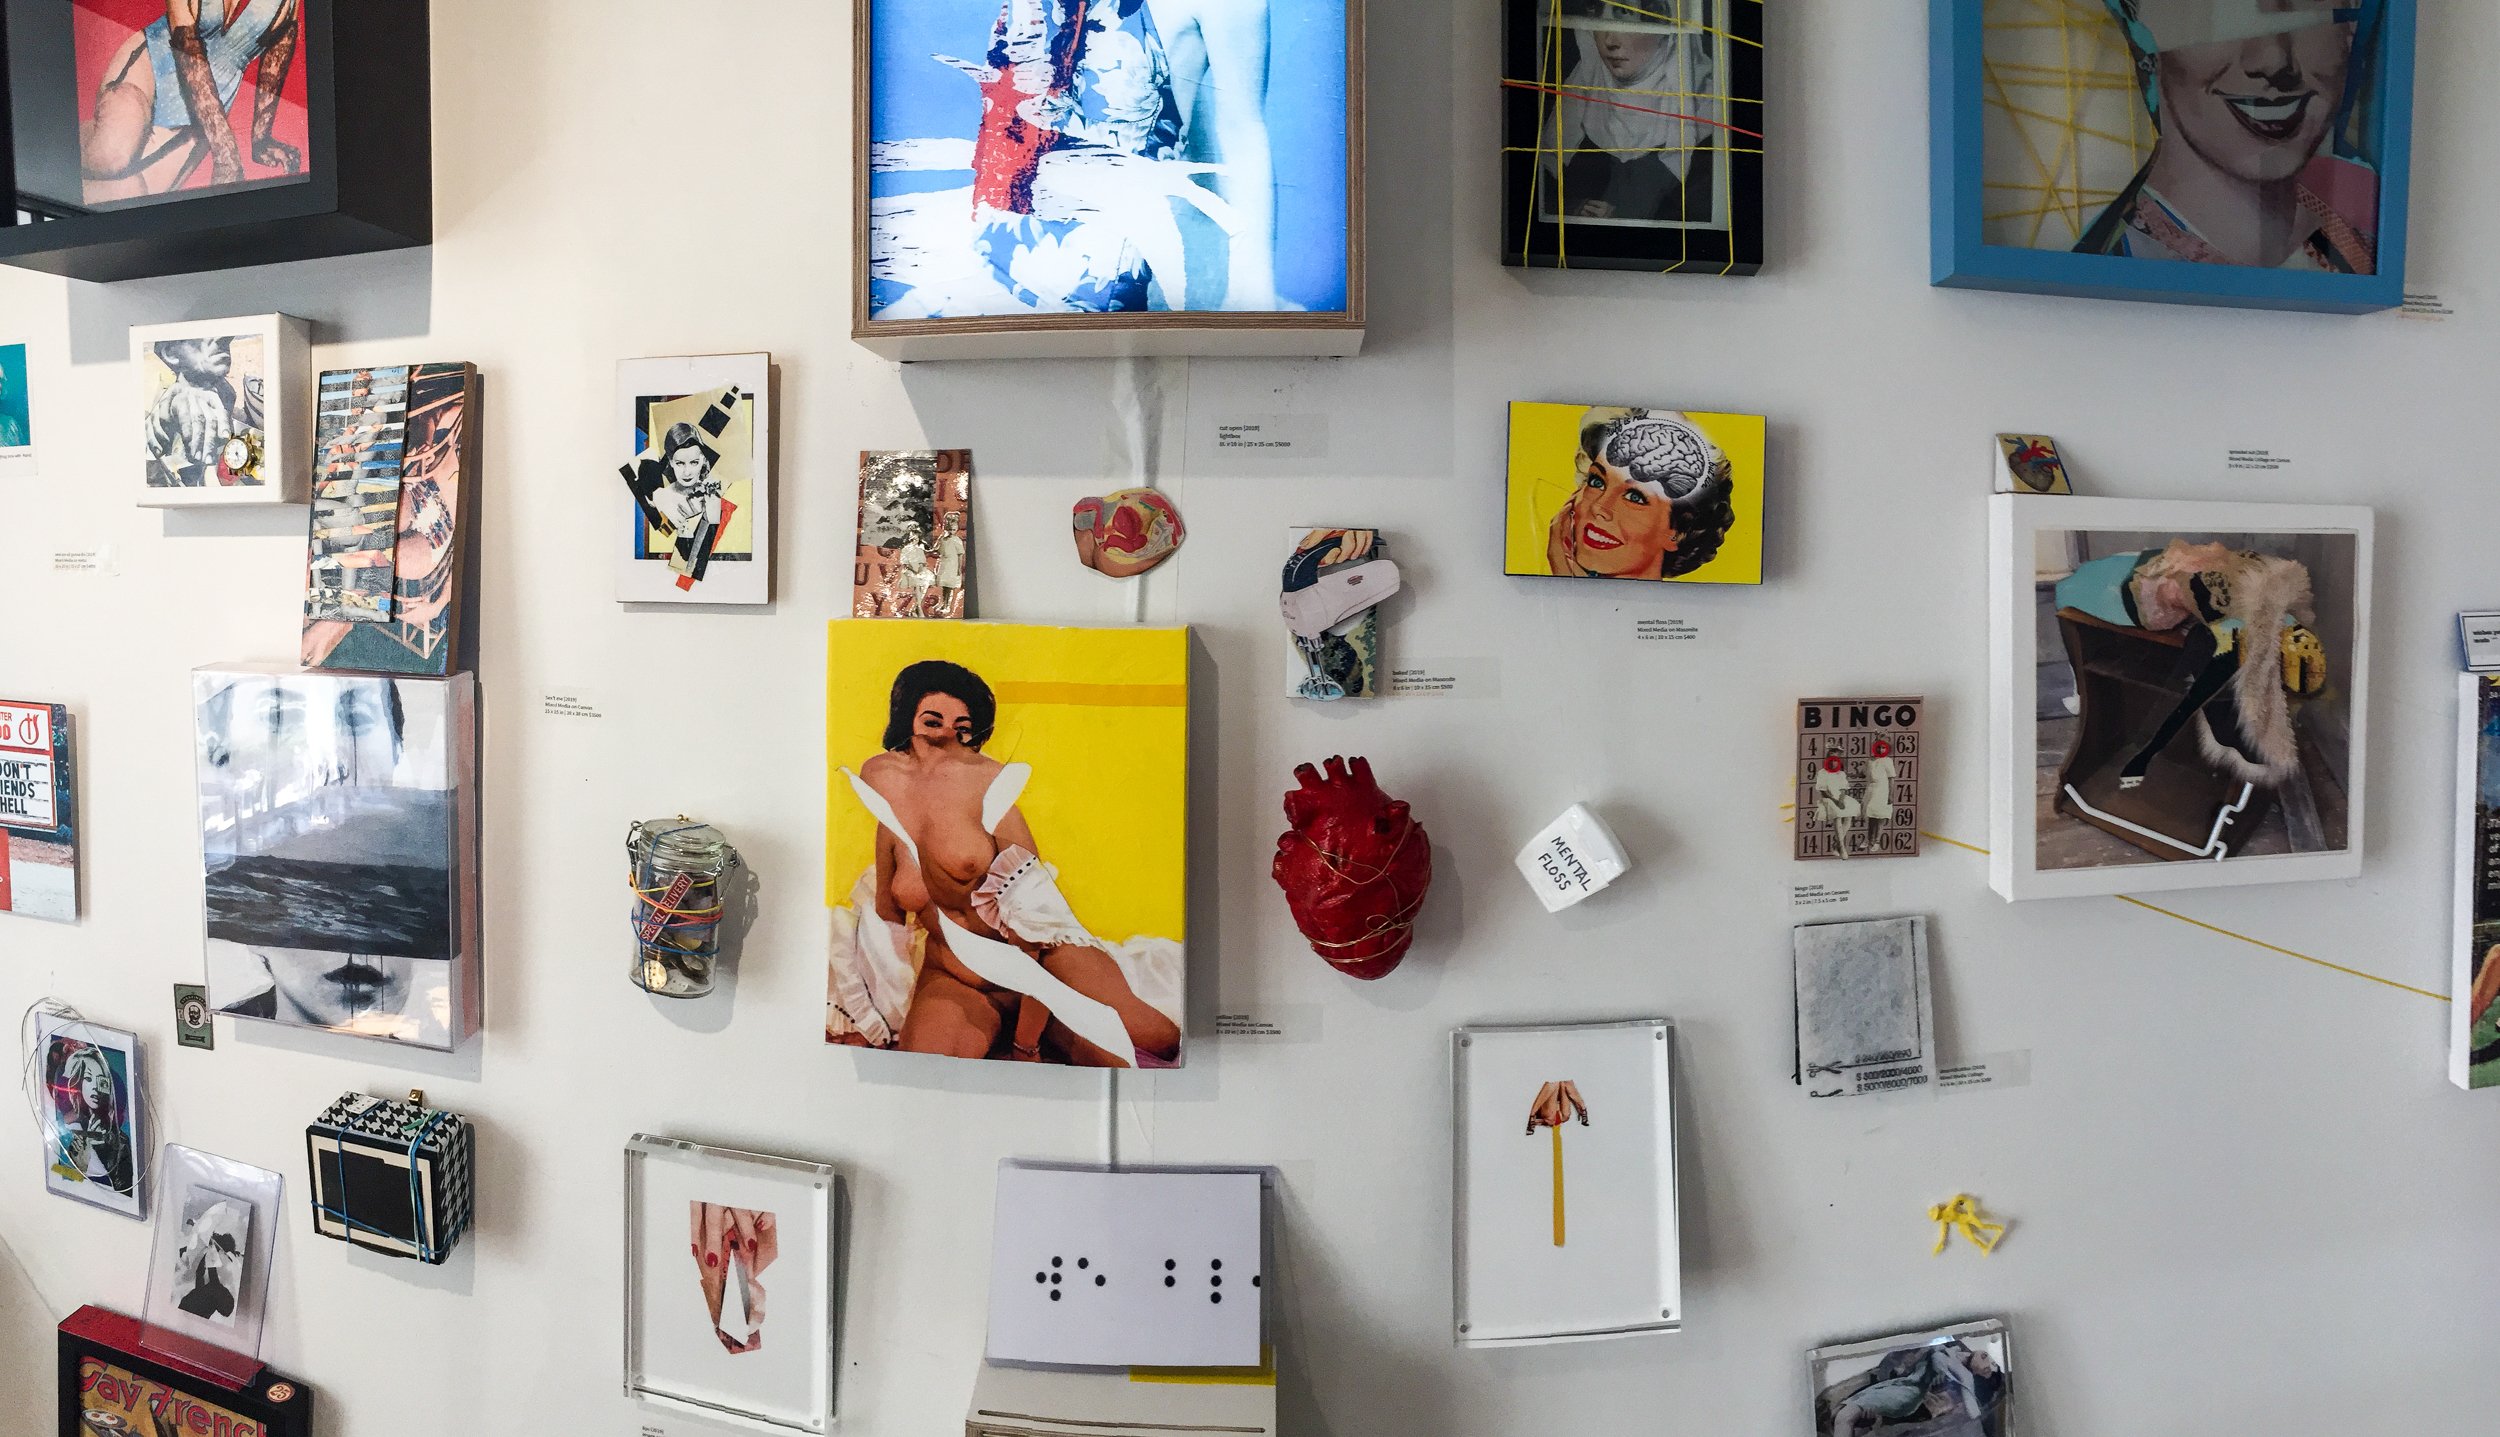 Faena-Exhibition-Images-127.jpg